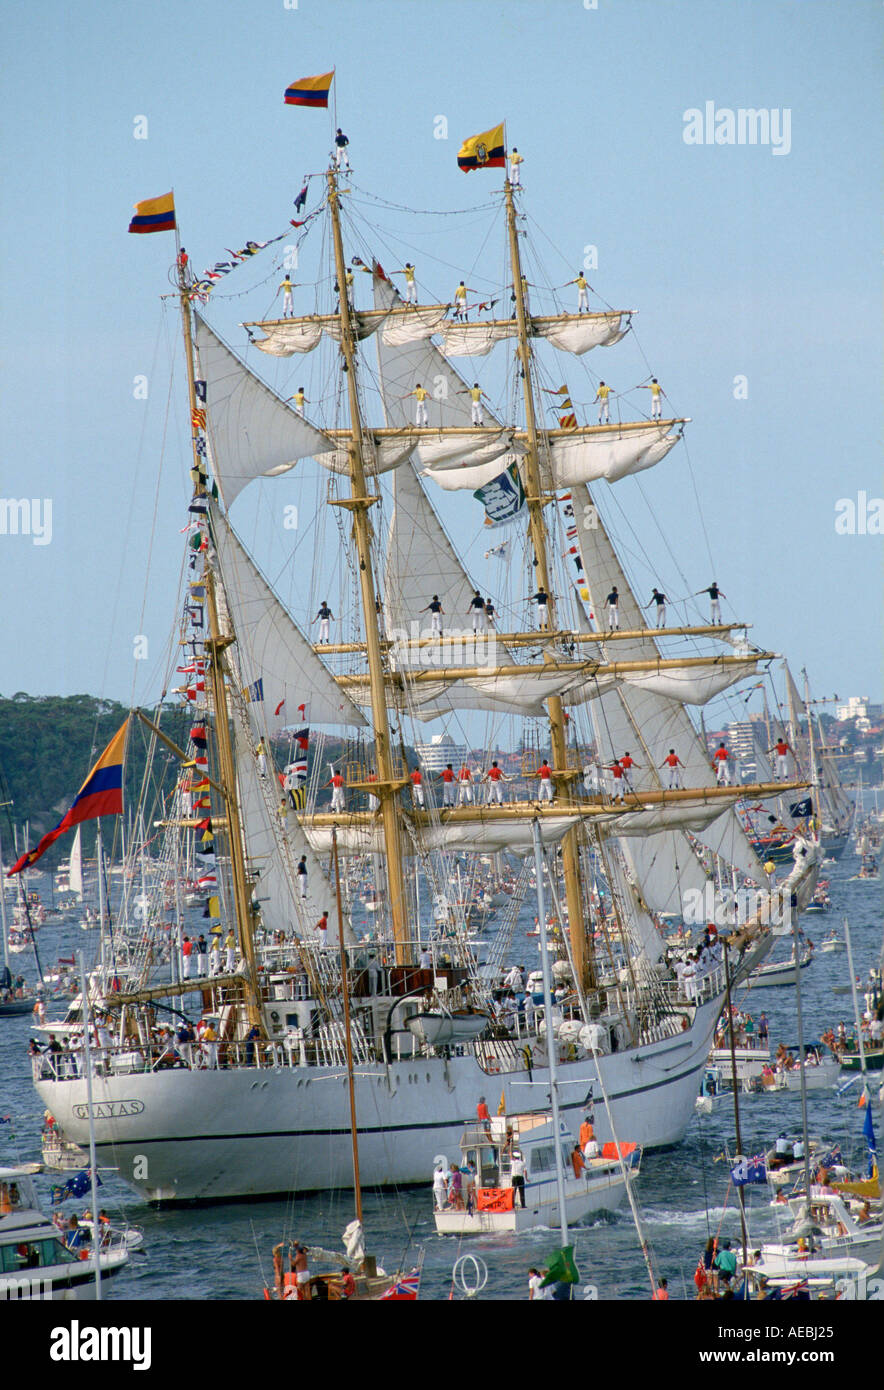 Bicentennial Day Sydney Harbour Australia - Stock Image